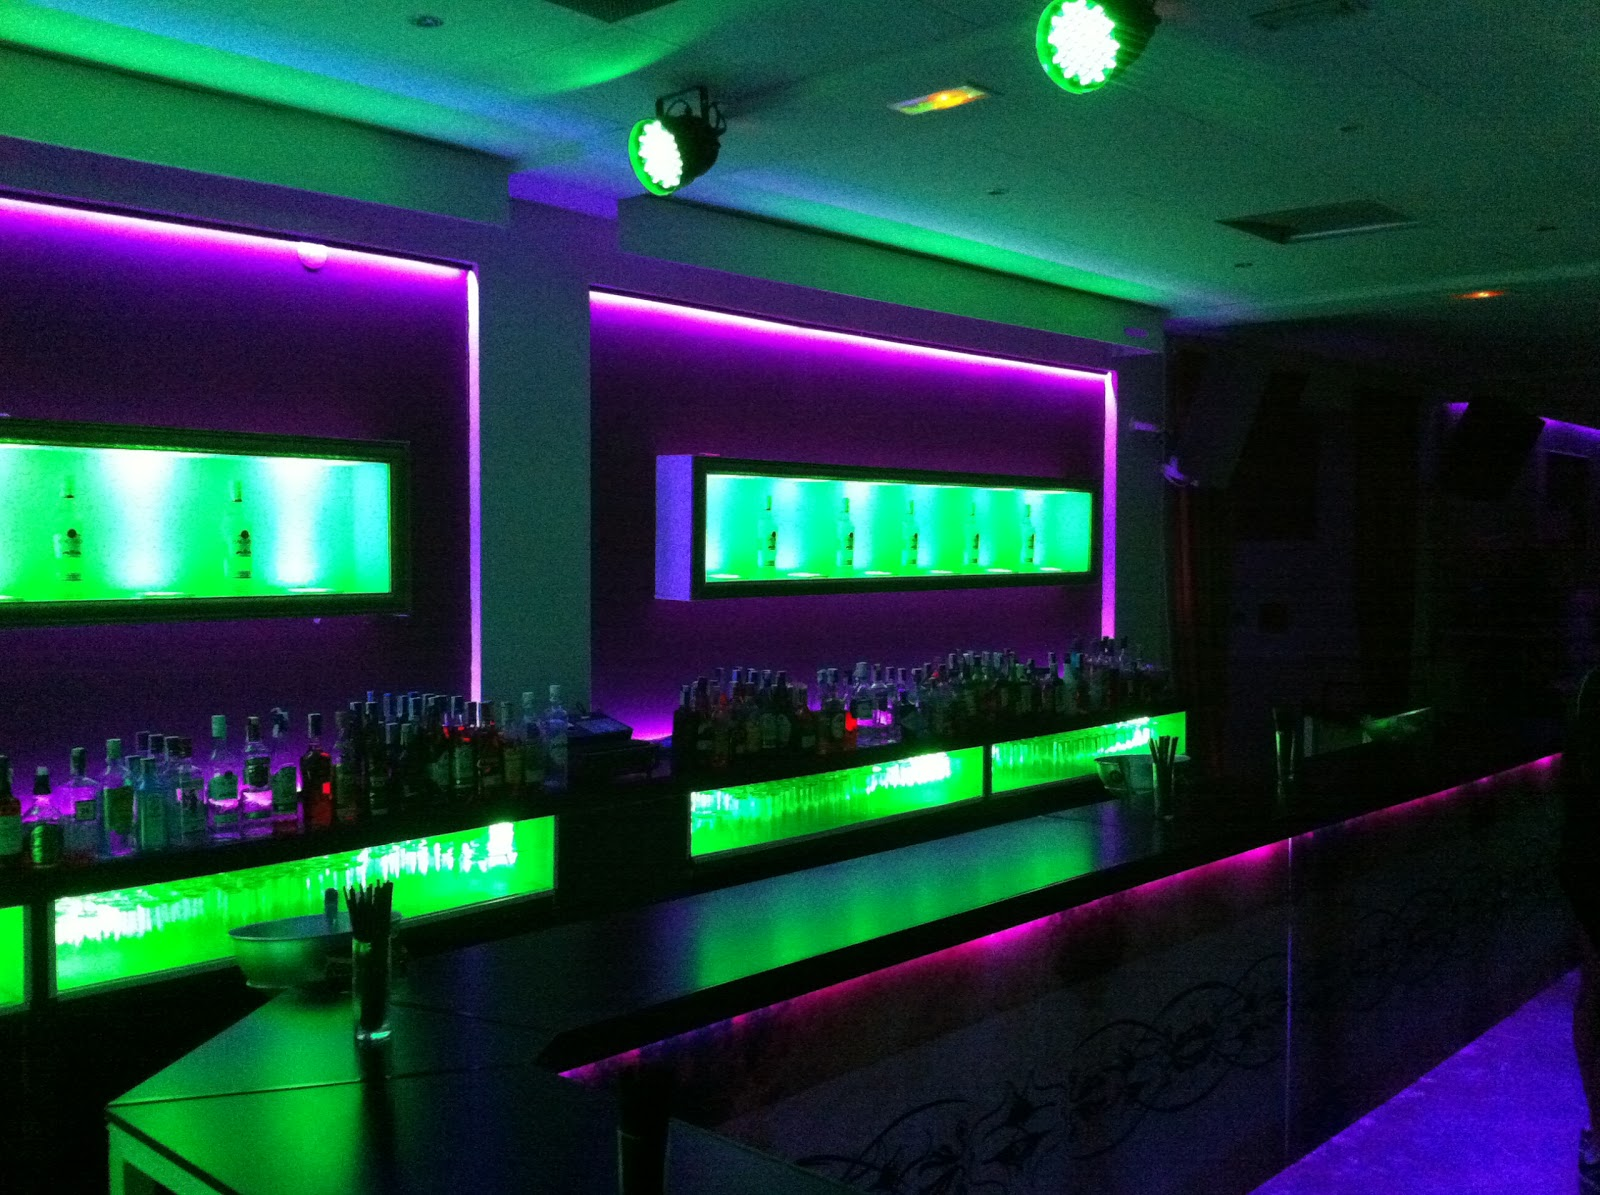 Discotecas 365 for Decoracion iluminacion led